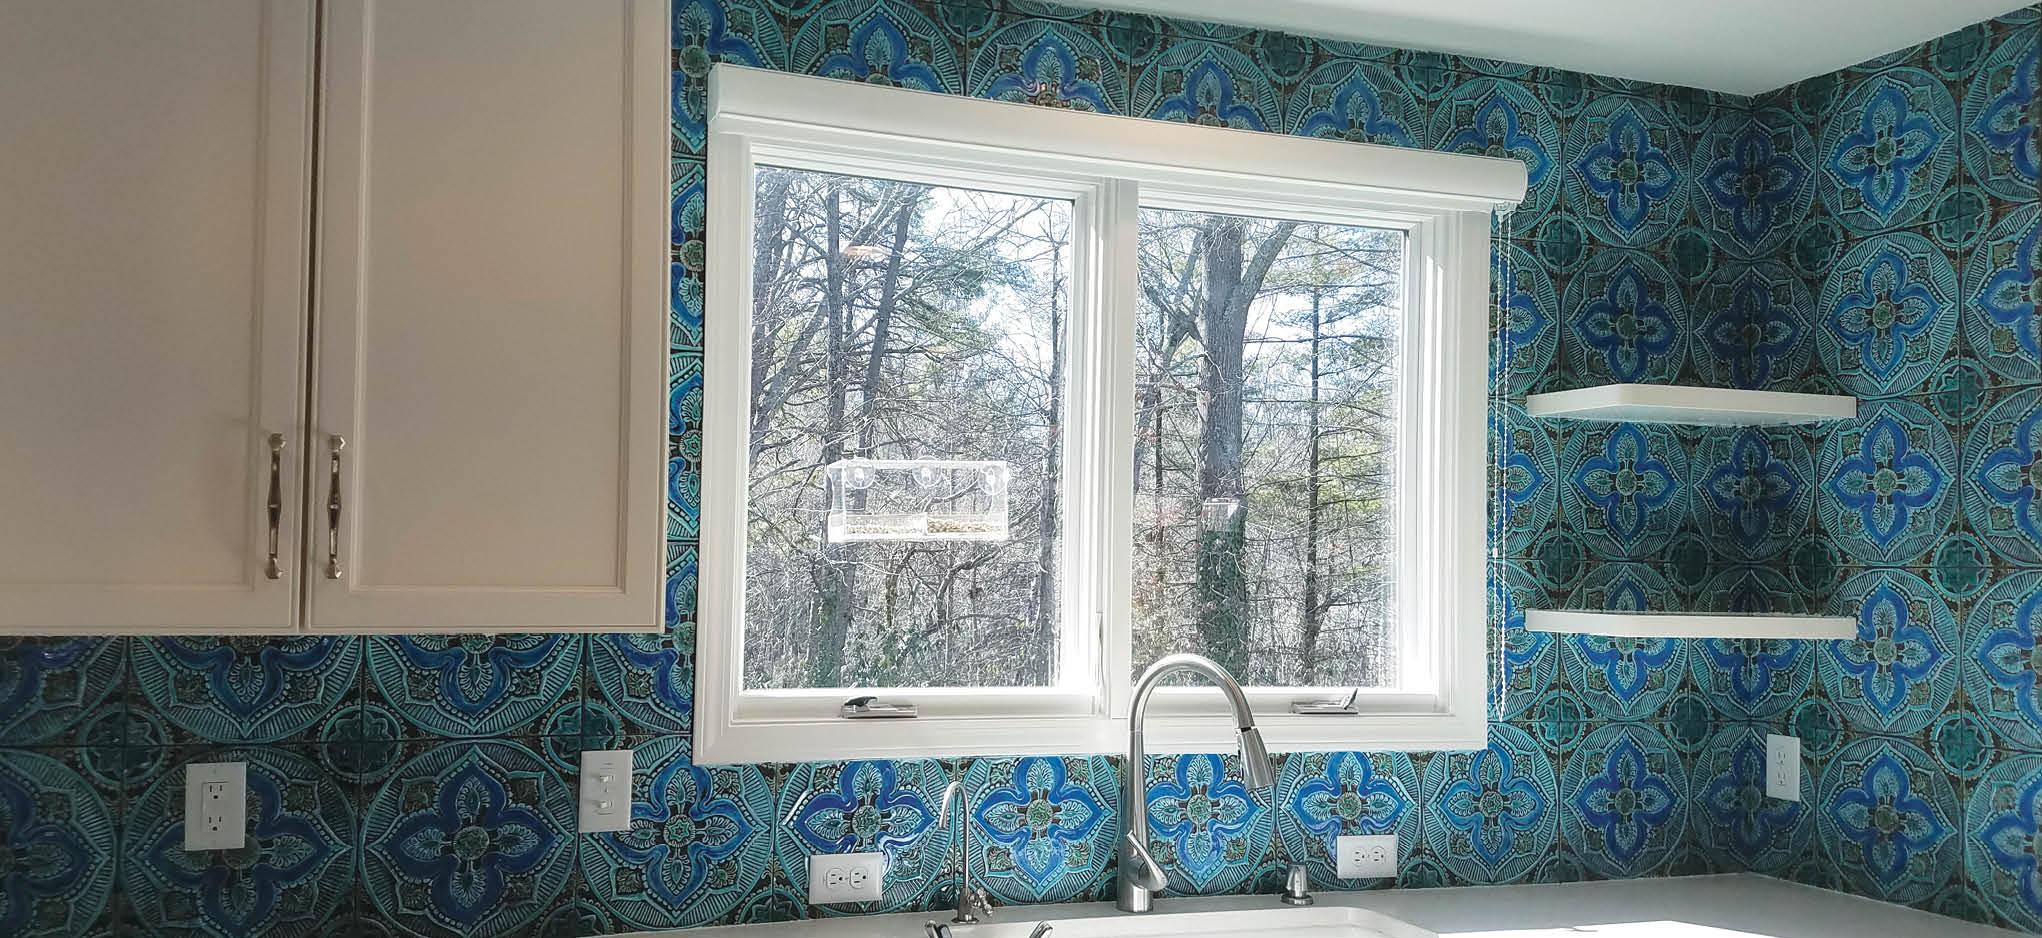 kitchen tiles image